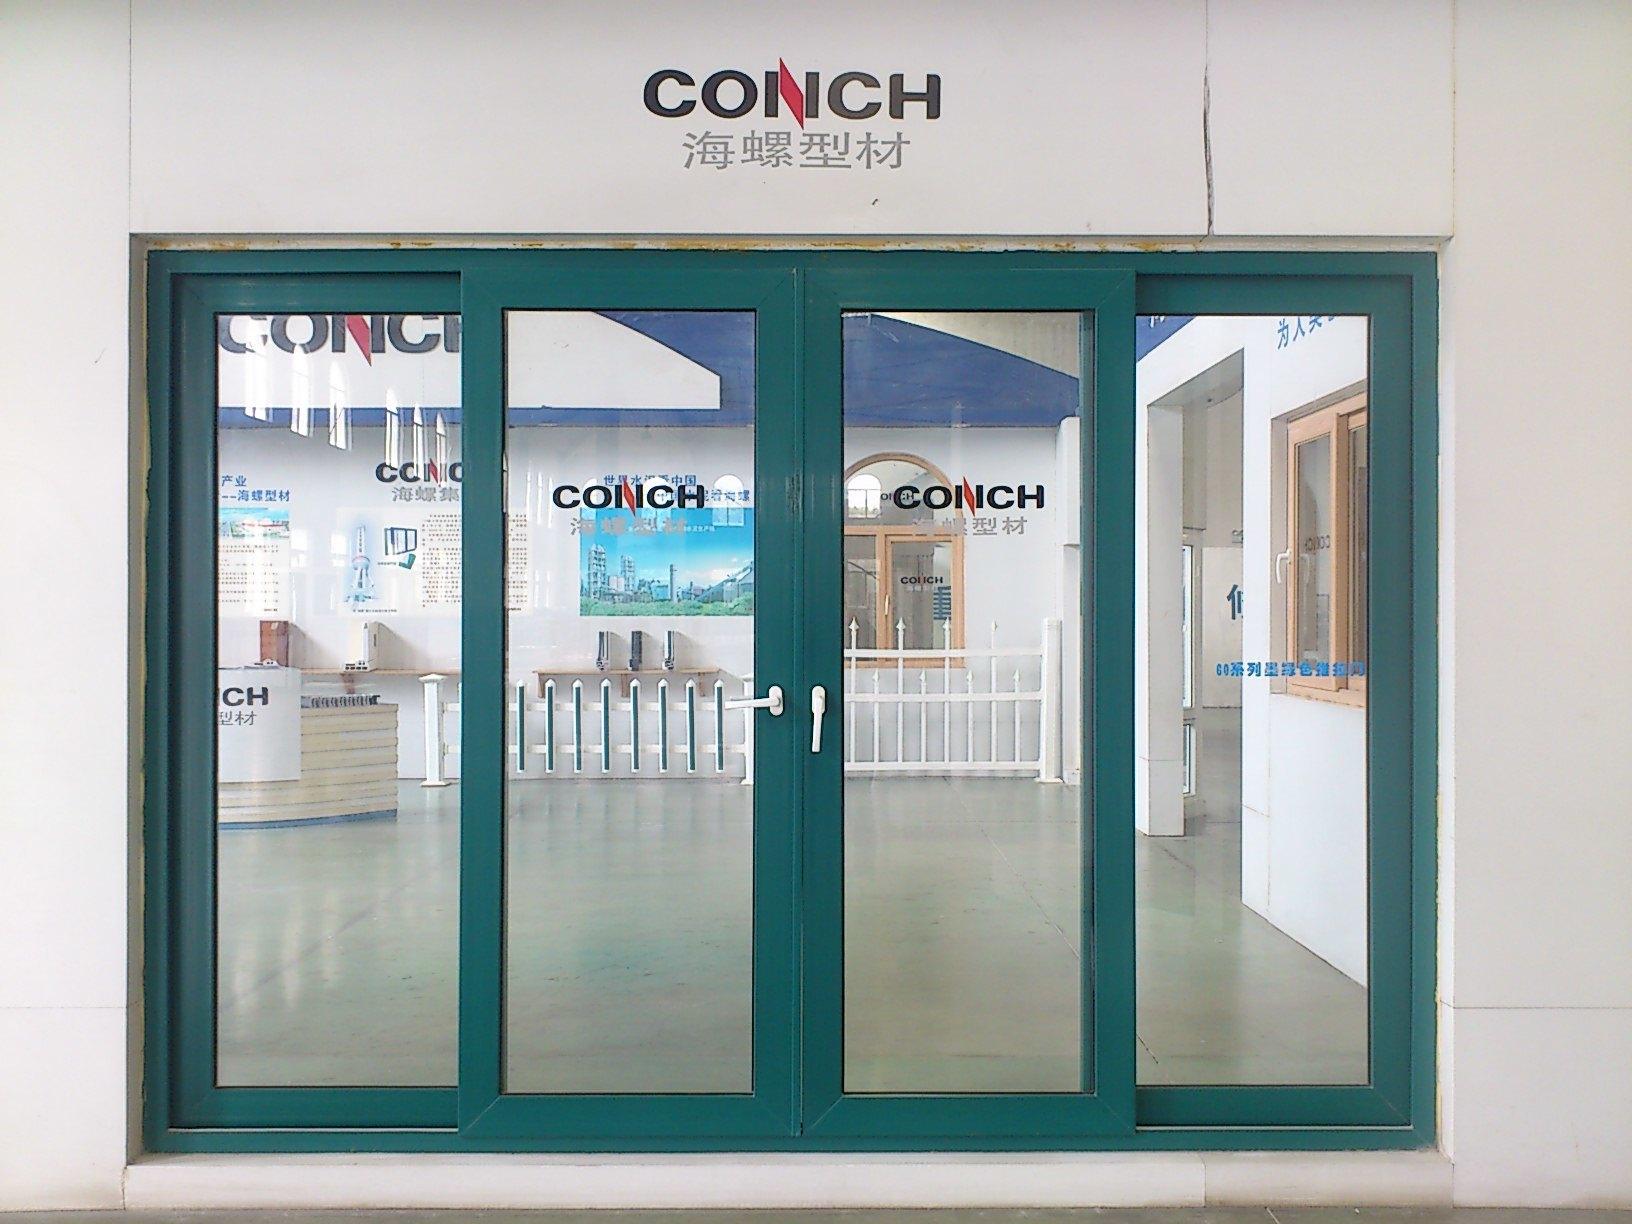 China Conch 60mm Upvc Sliding Door For Balcony Garden And Etc Photos